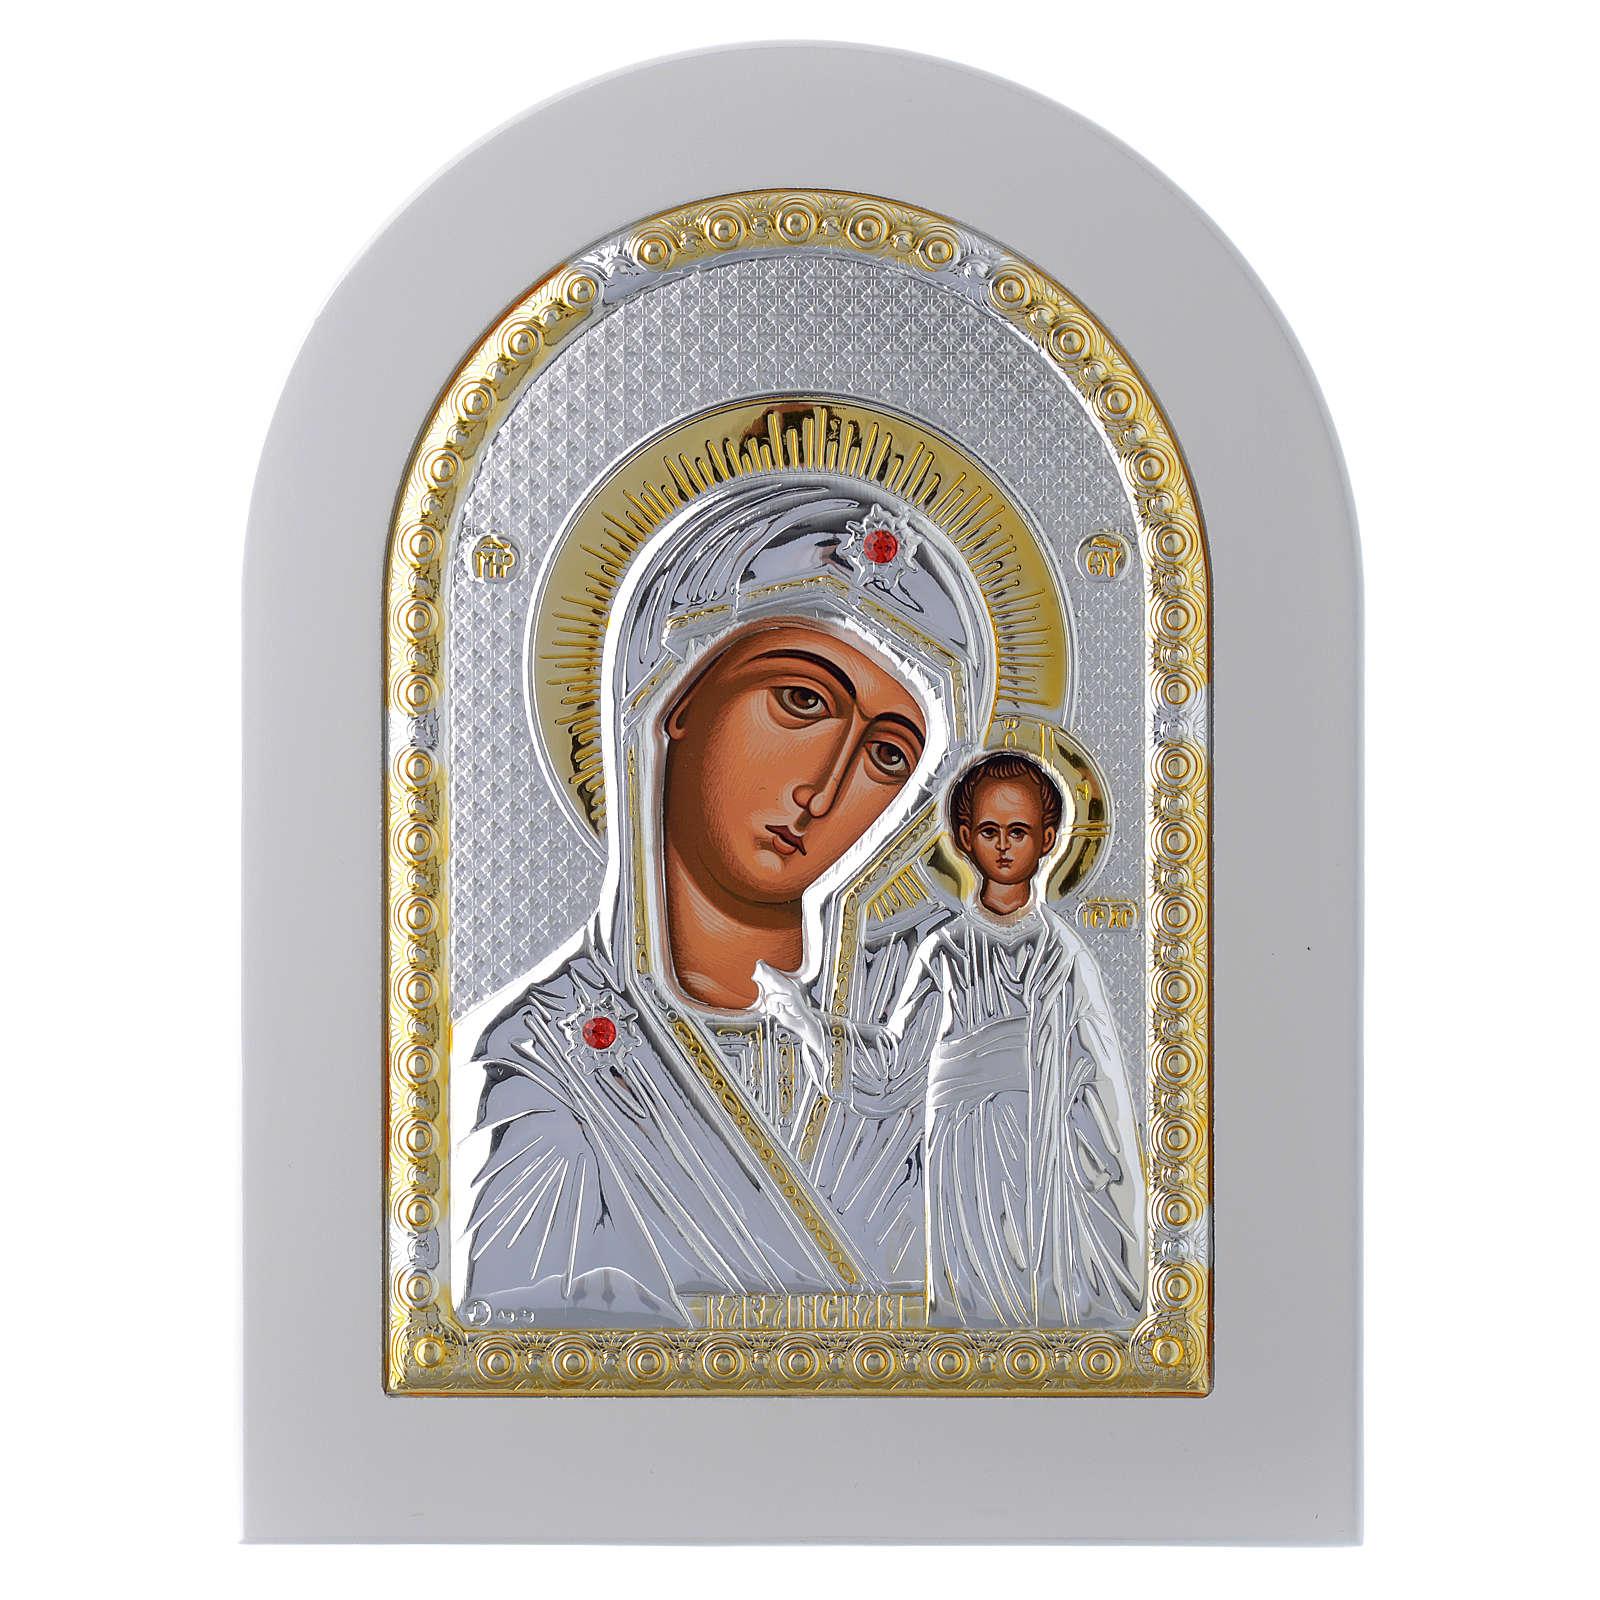 Greek silver icon Virgin of Kazan, gold finish 18x14 cm 4